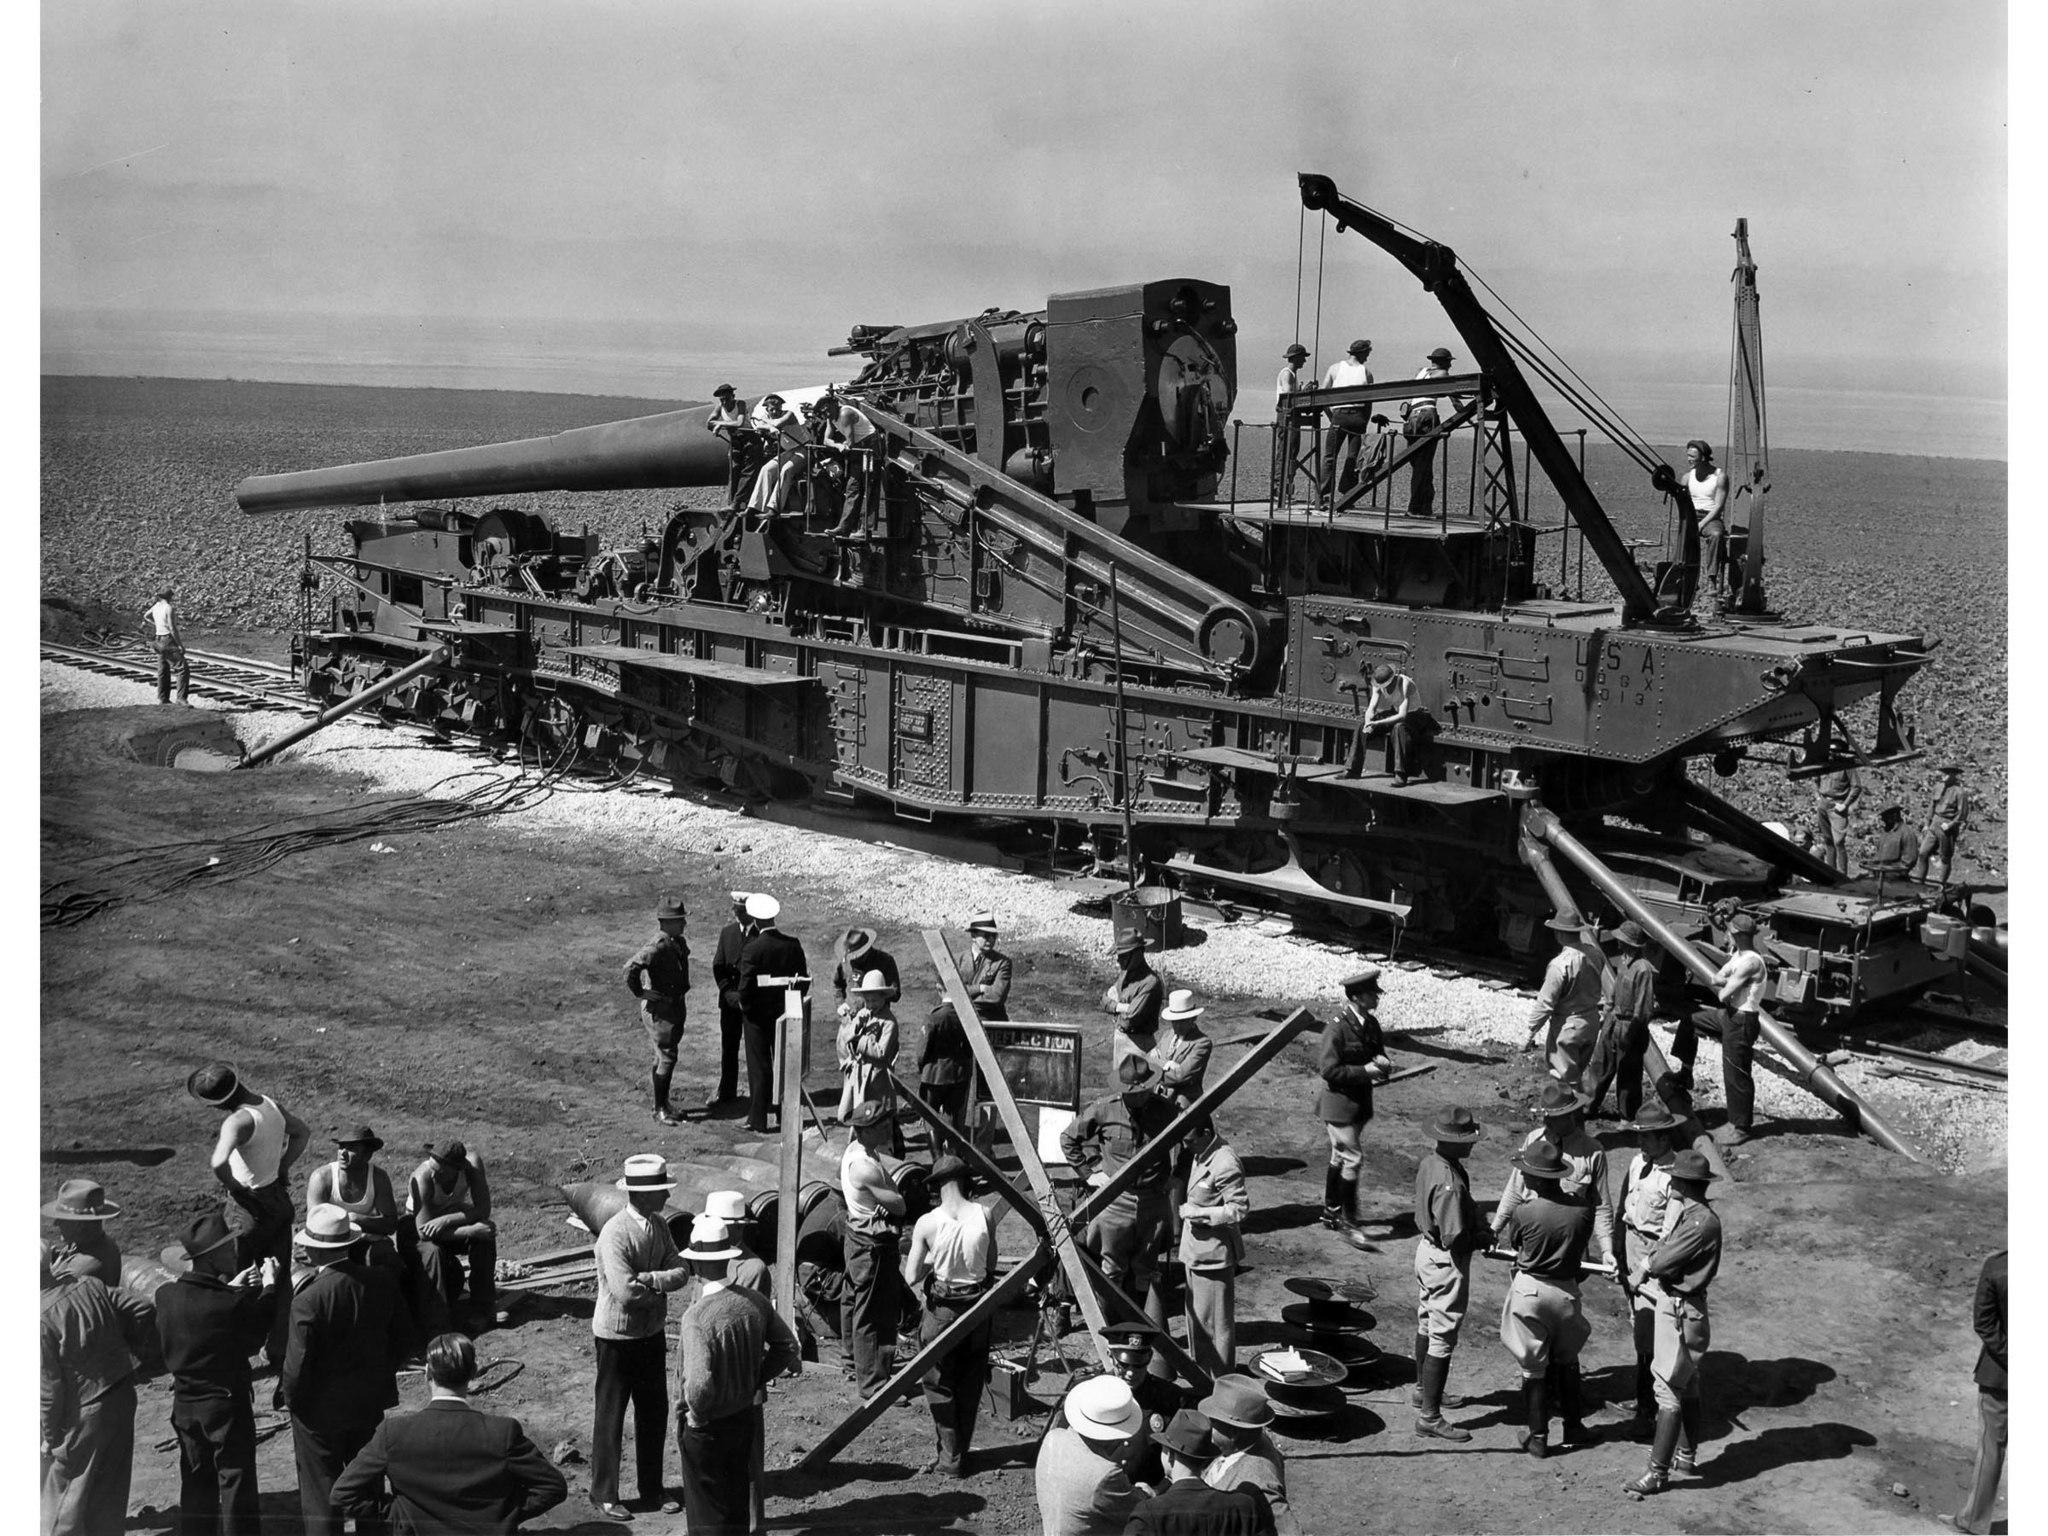 June 12, 1936: United States Army Coast Defense 14-inch railway gun is prepared for target practice